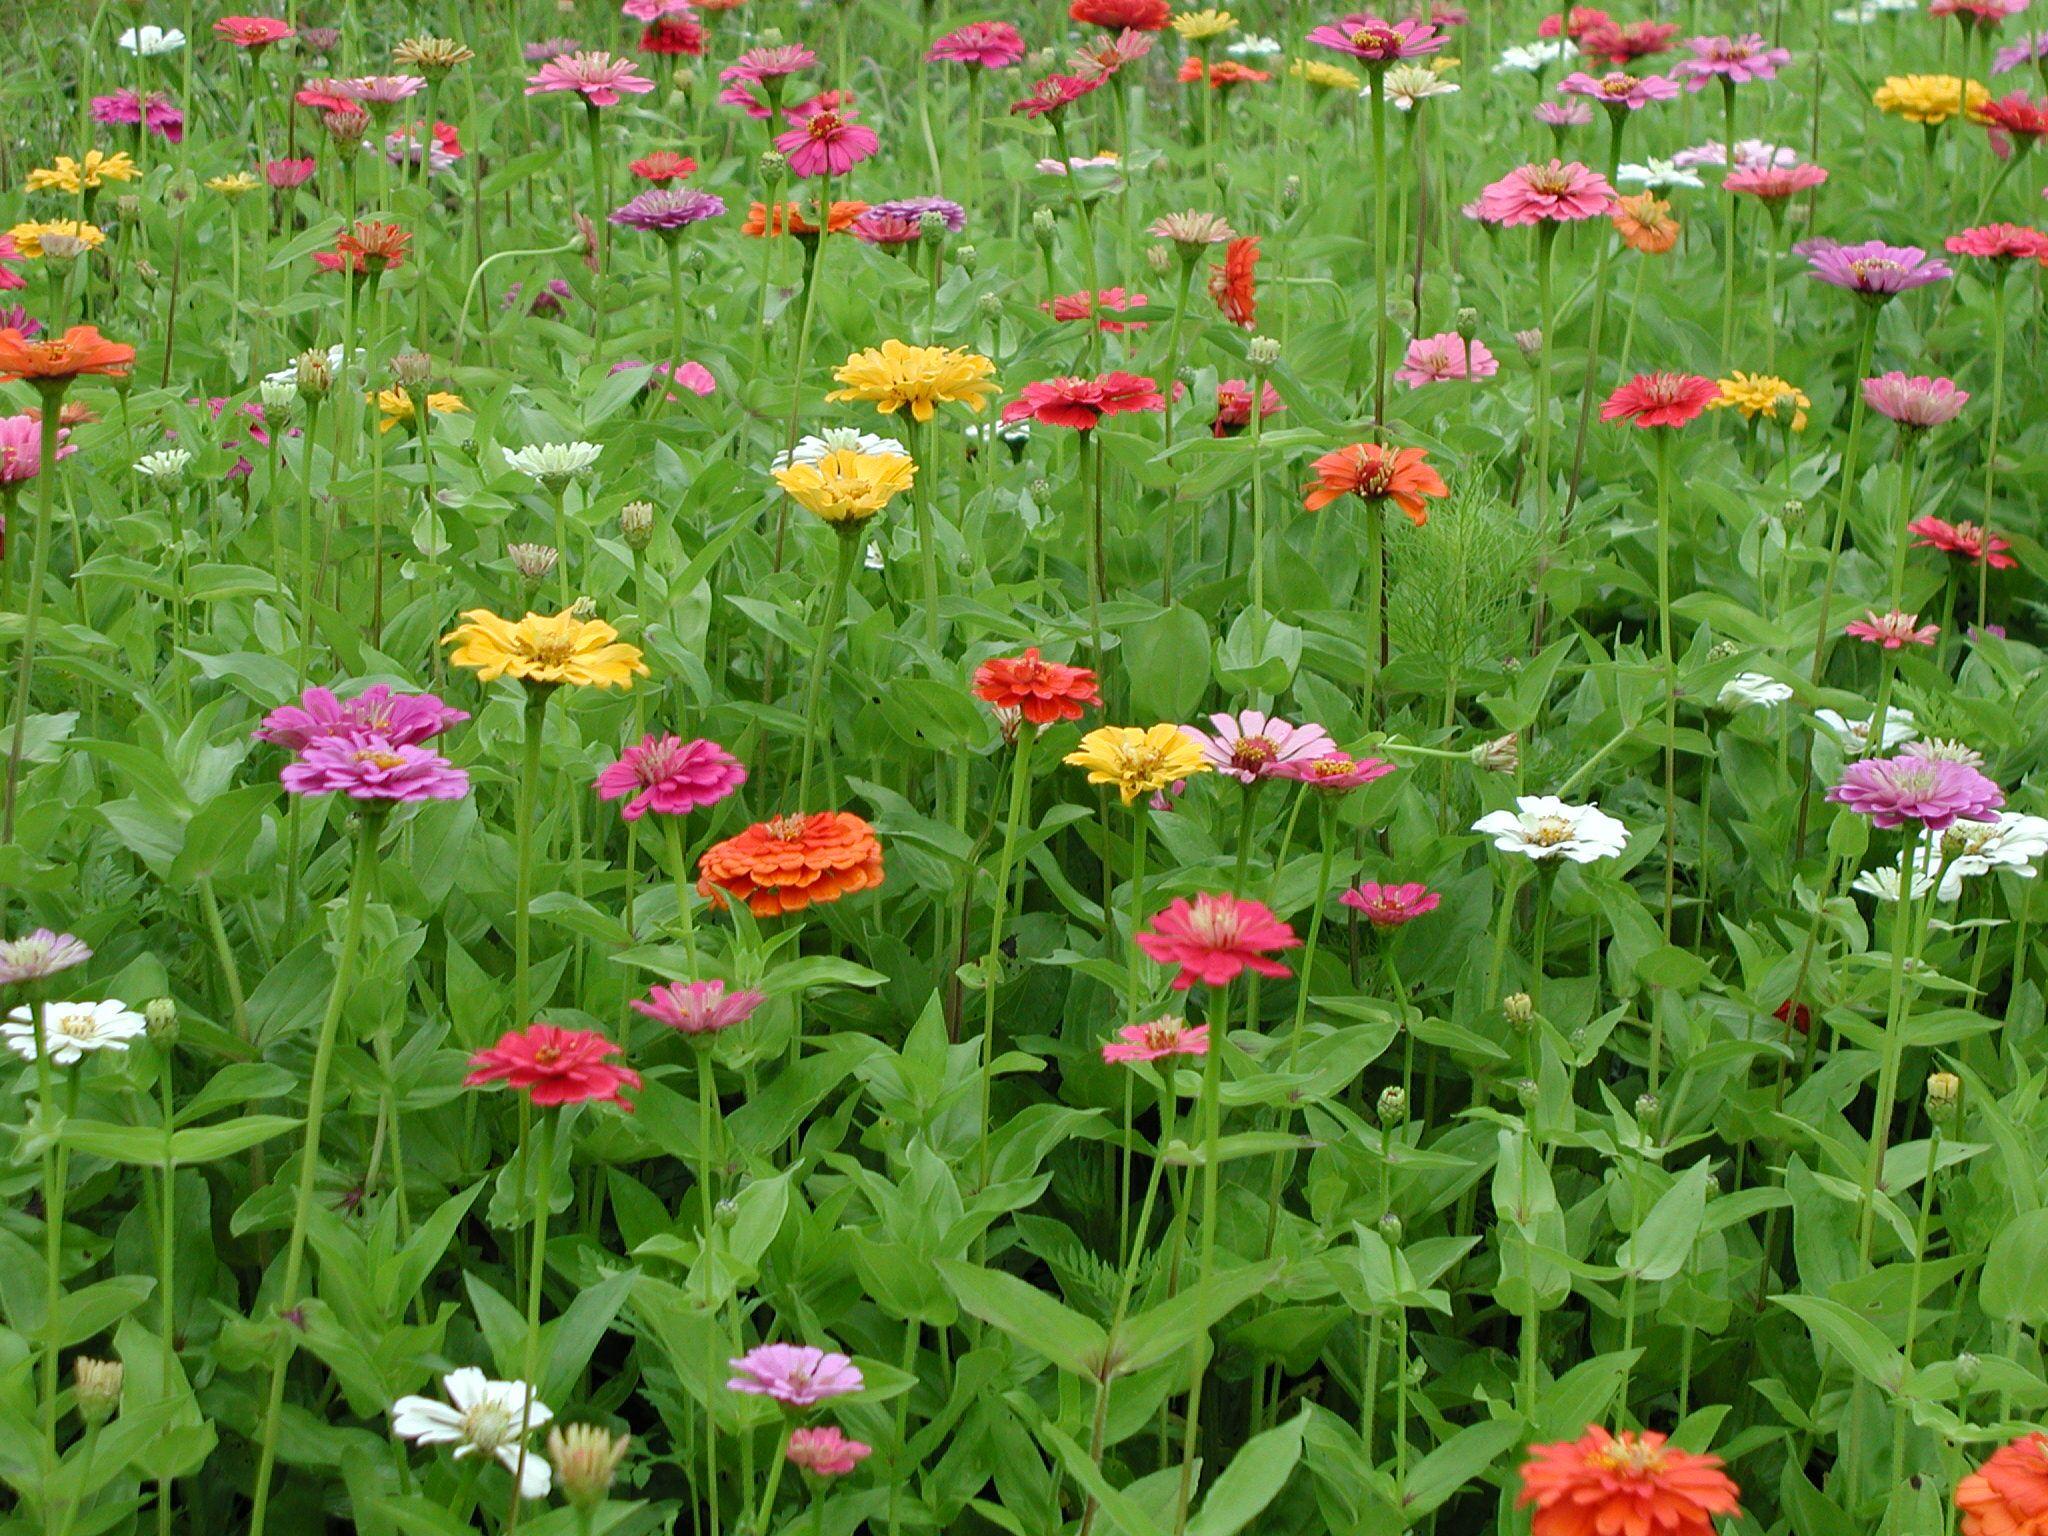 Image from http://hillcrest97.com/wildflower%20field%202.JPG.